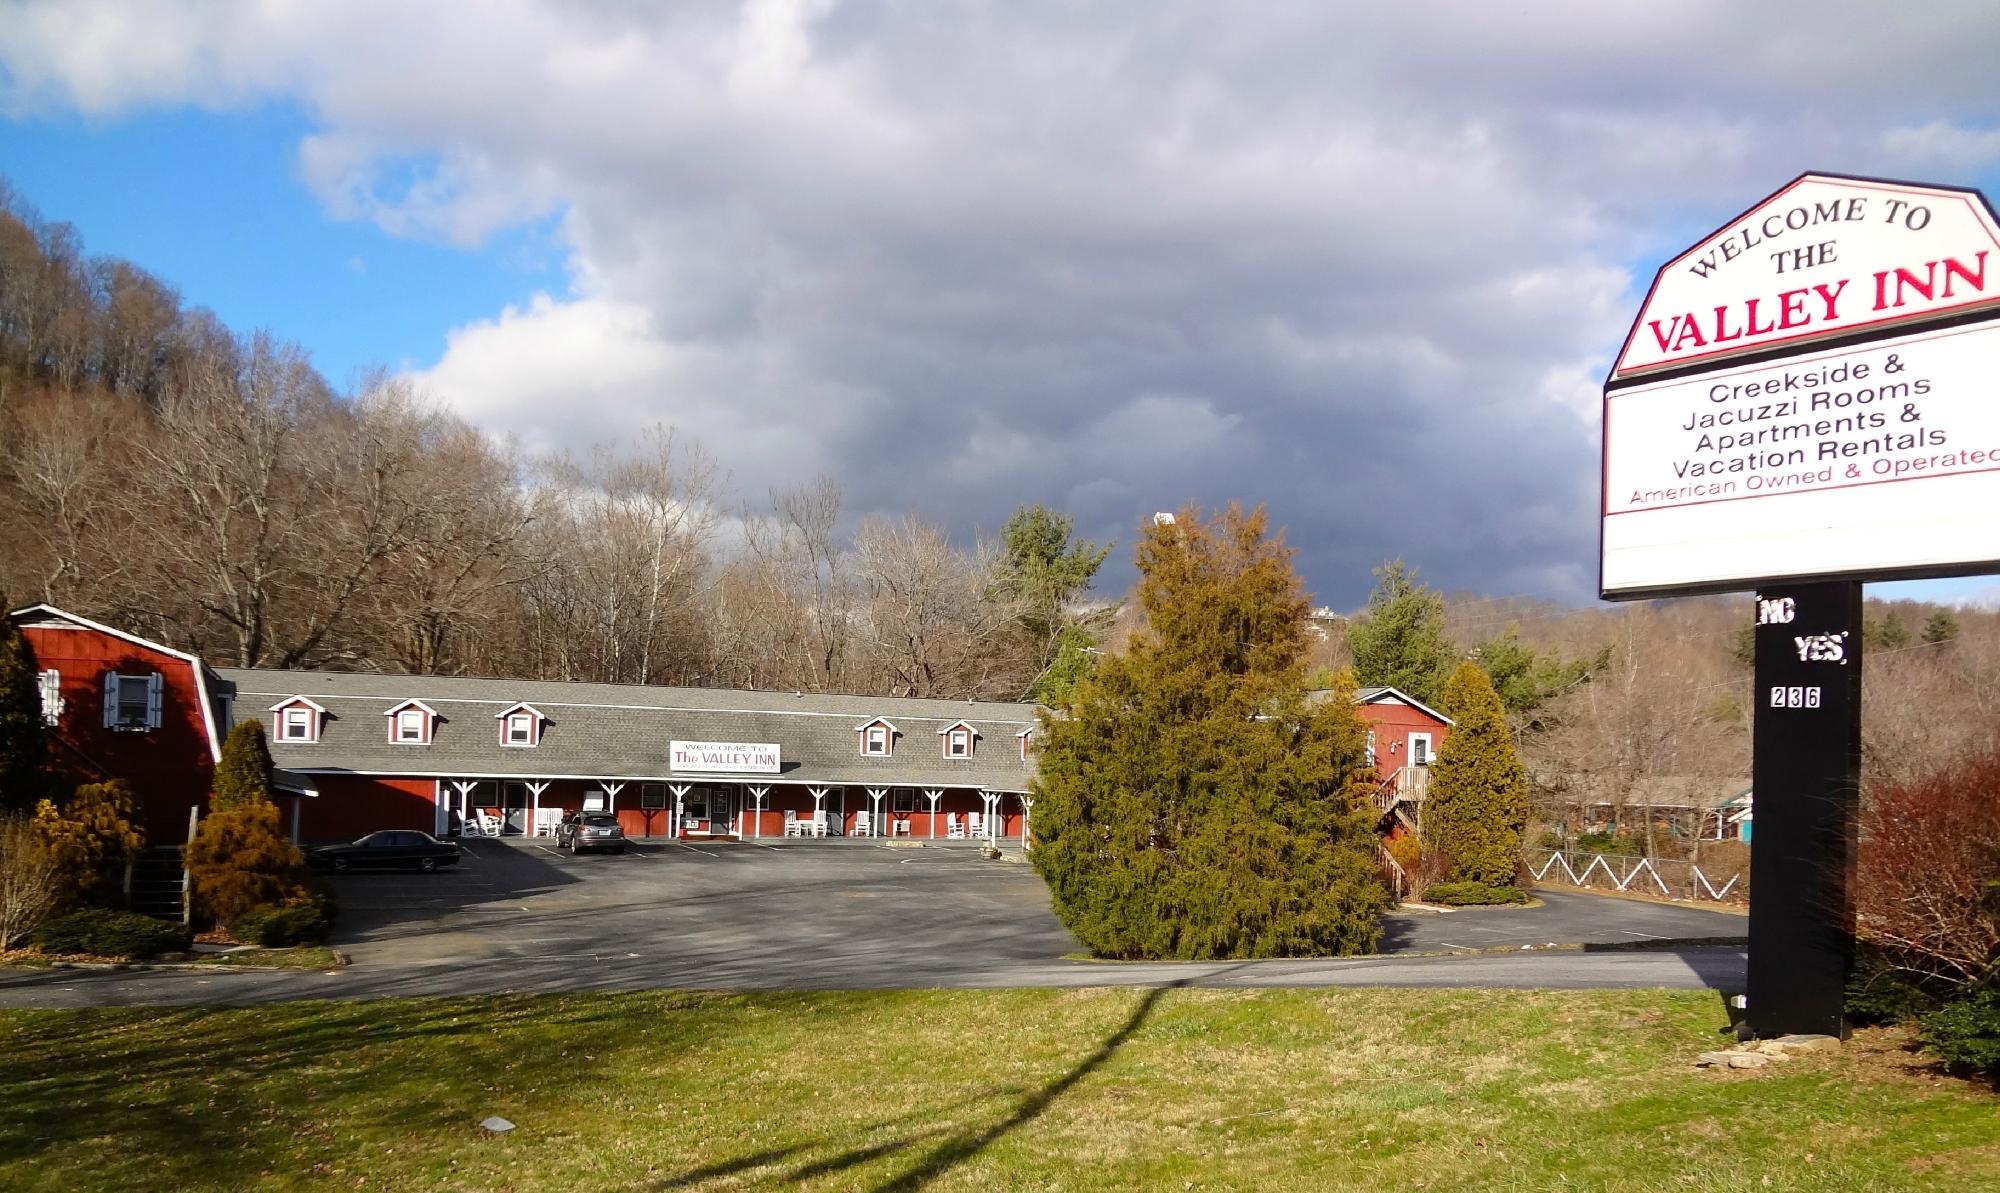 The Valley Inn